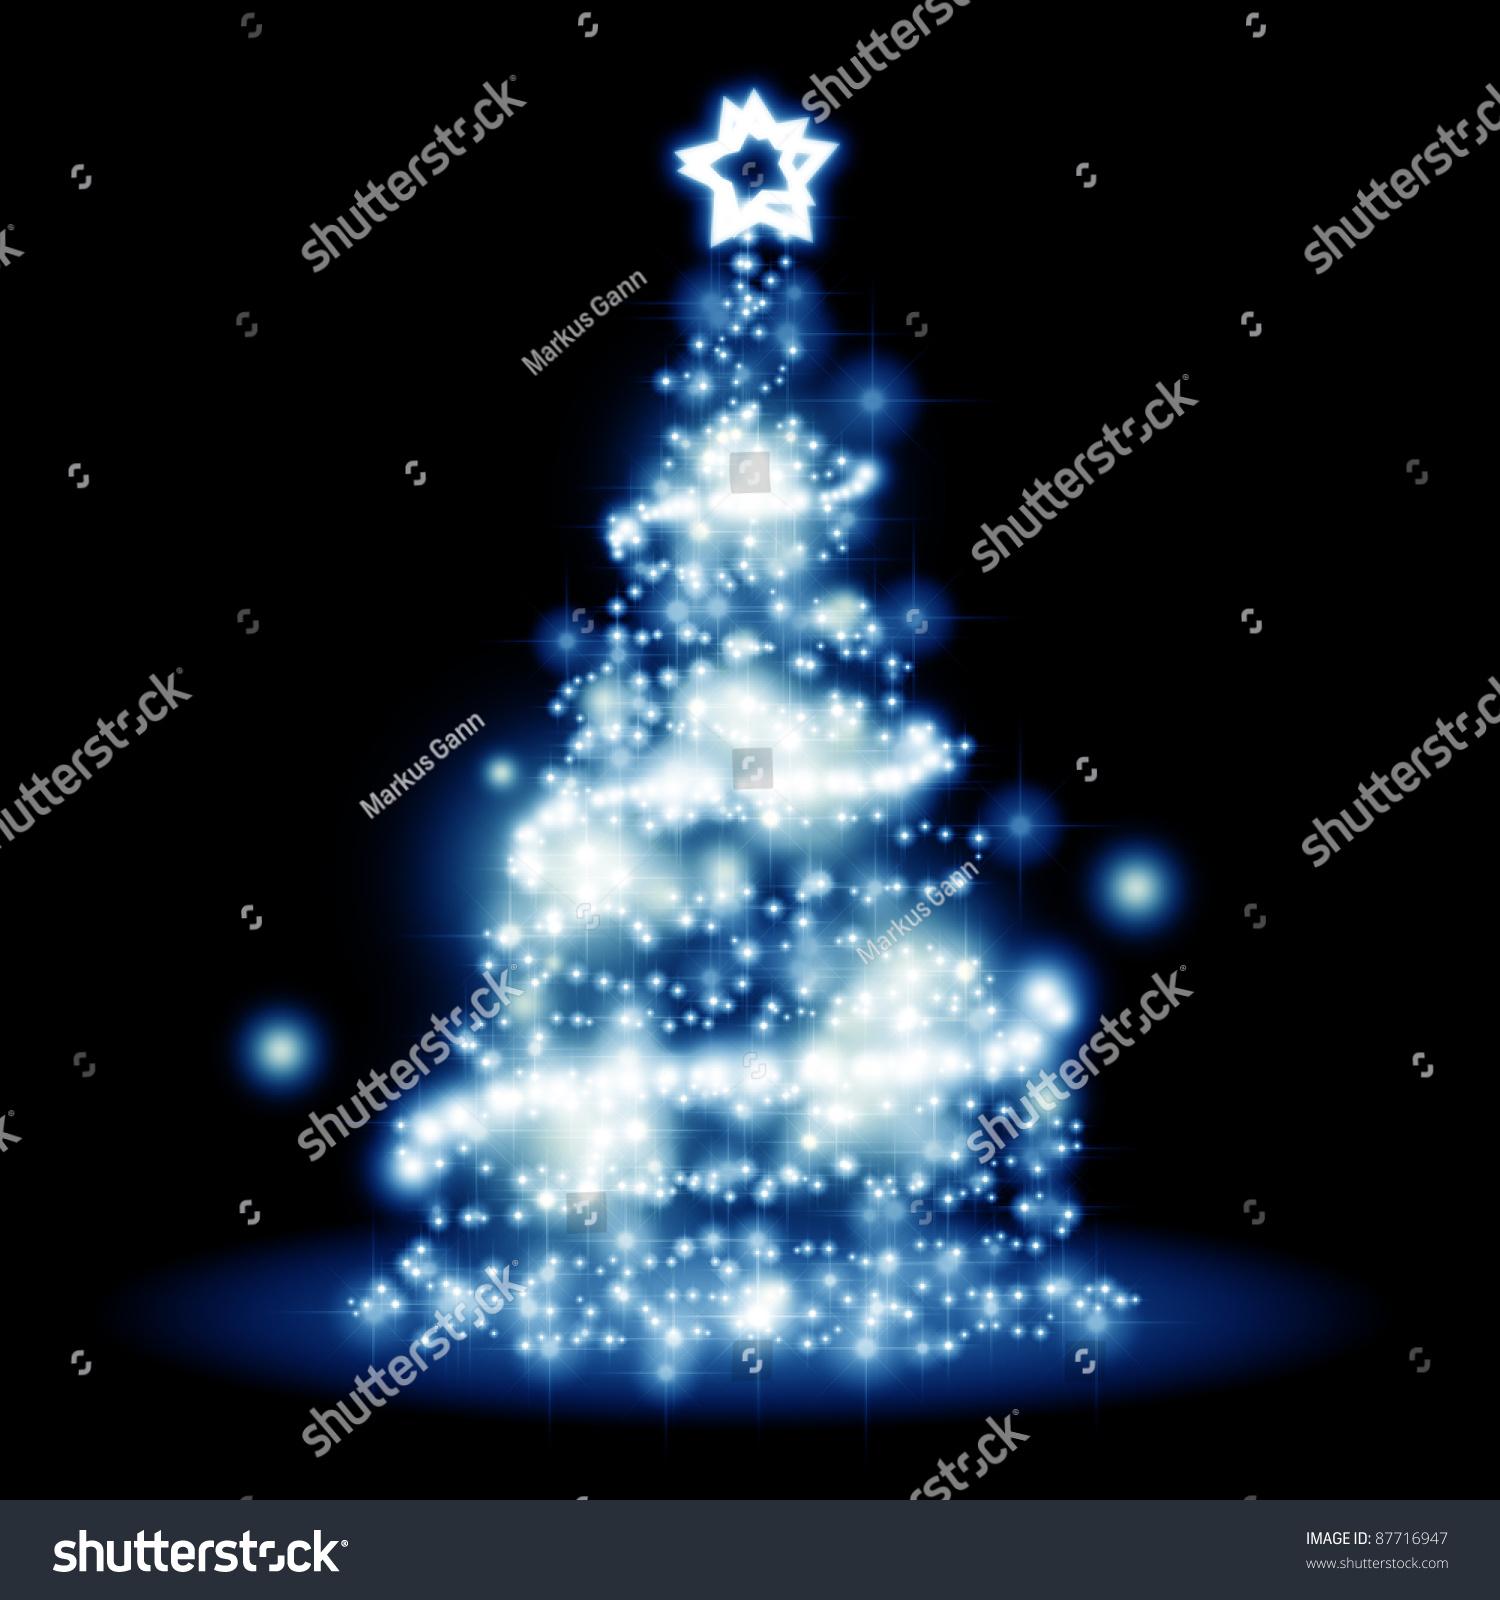 Nice Christmas Tree image nice christmas tree lights background stock illustration